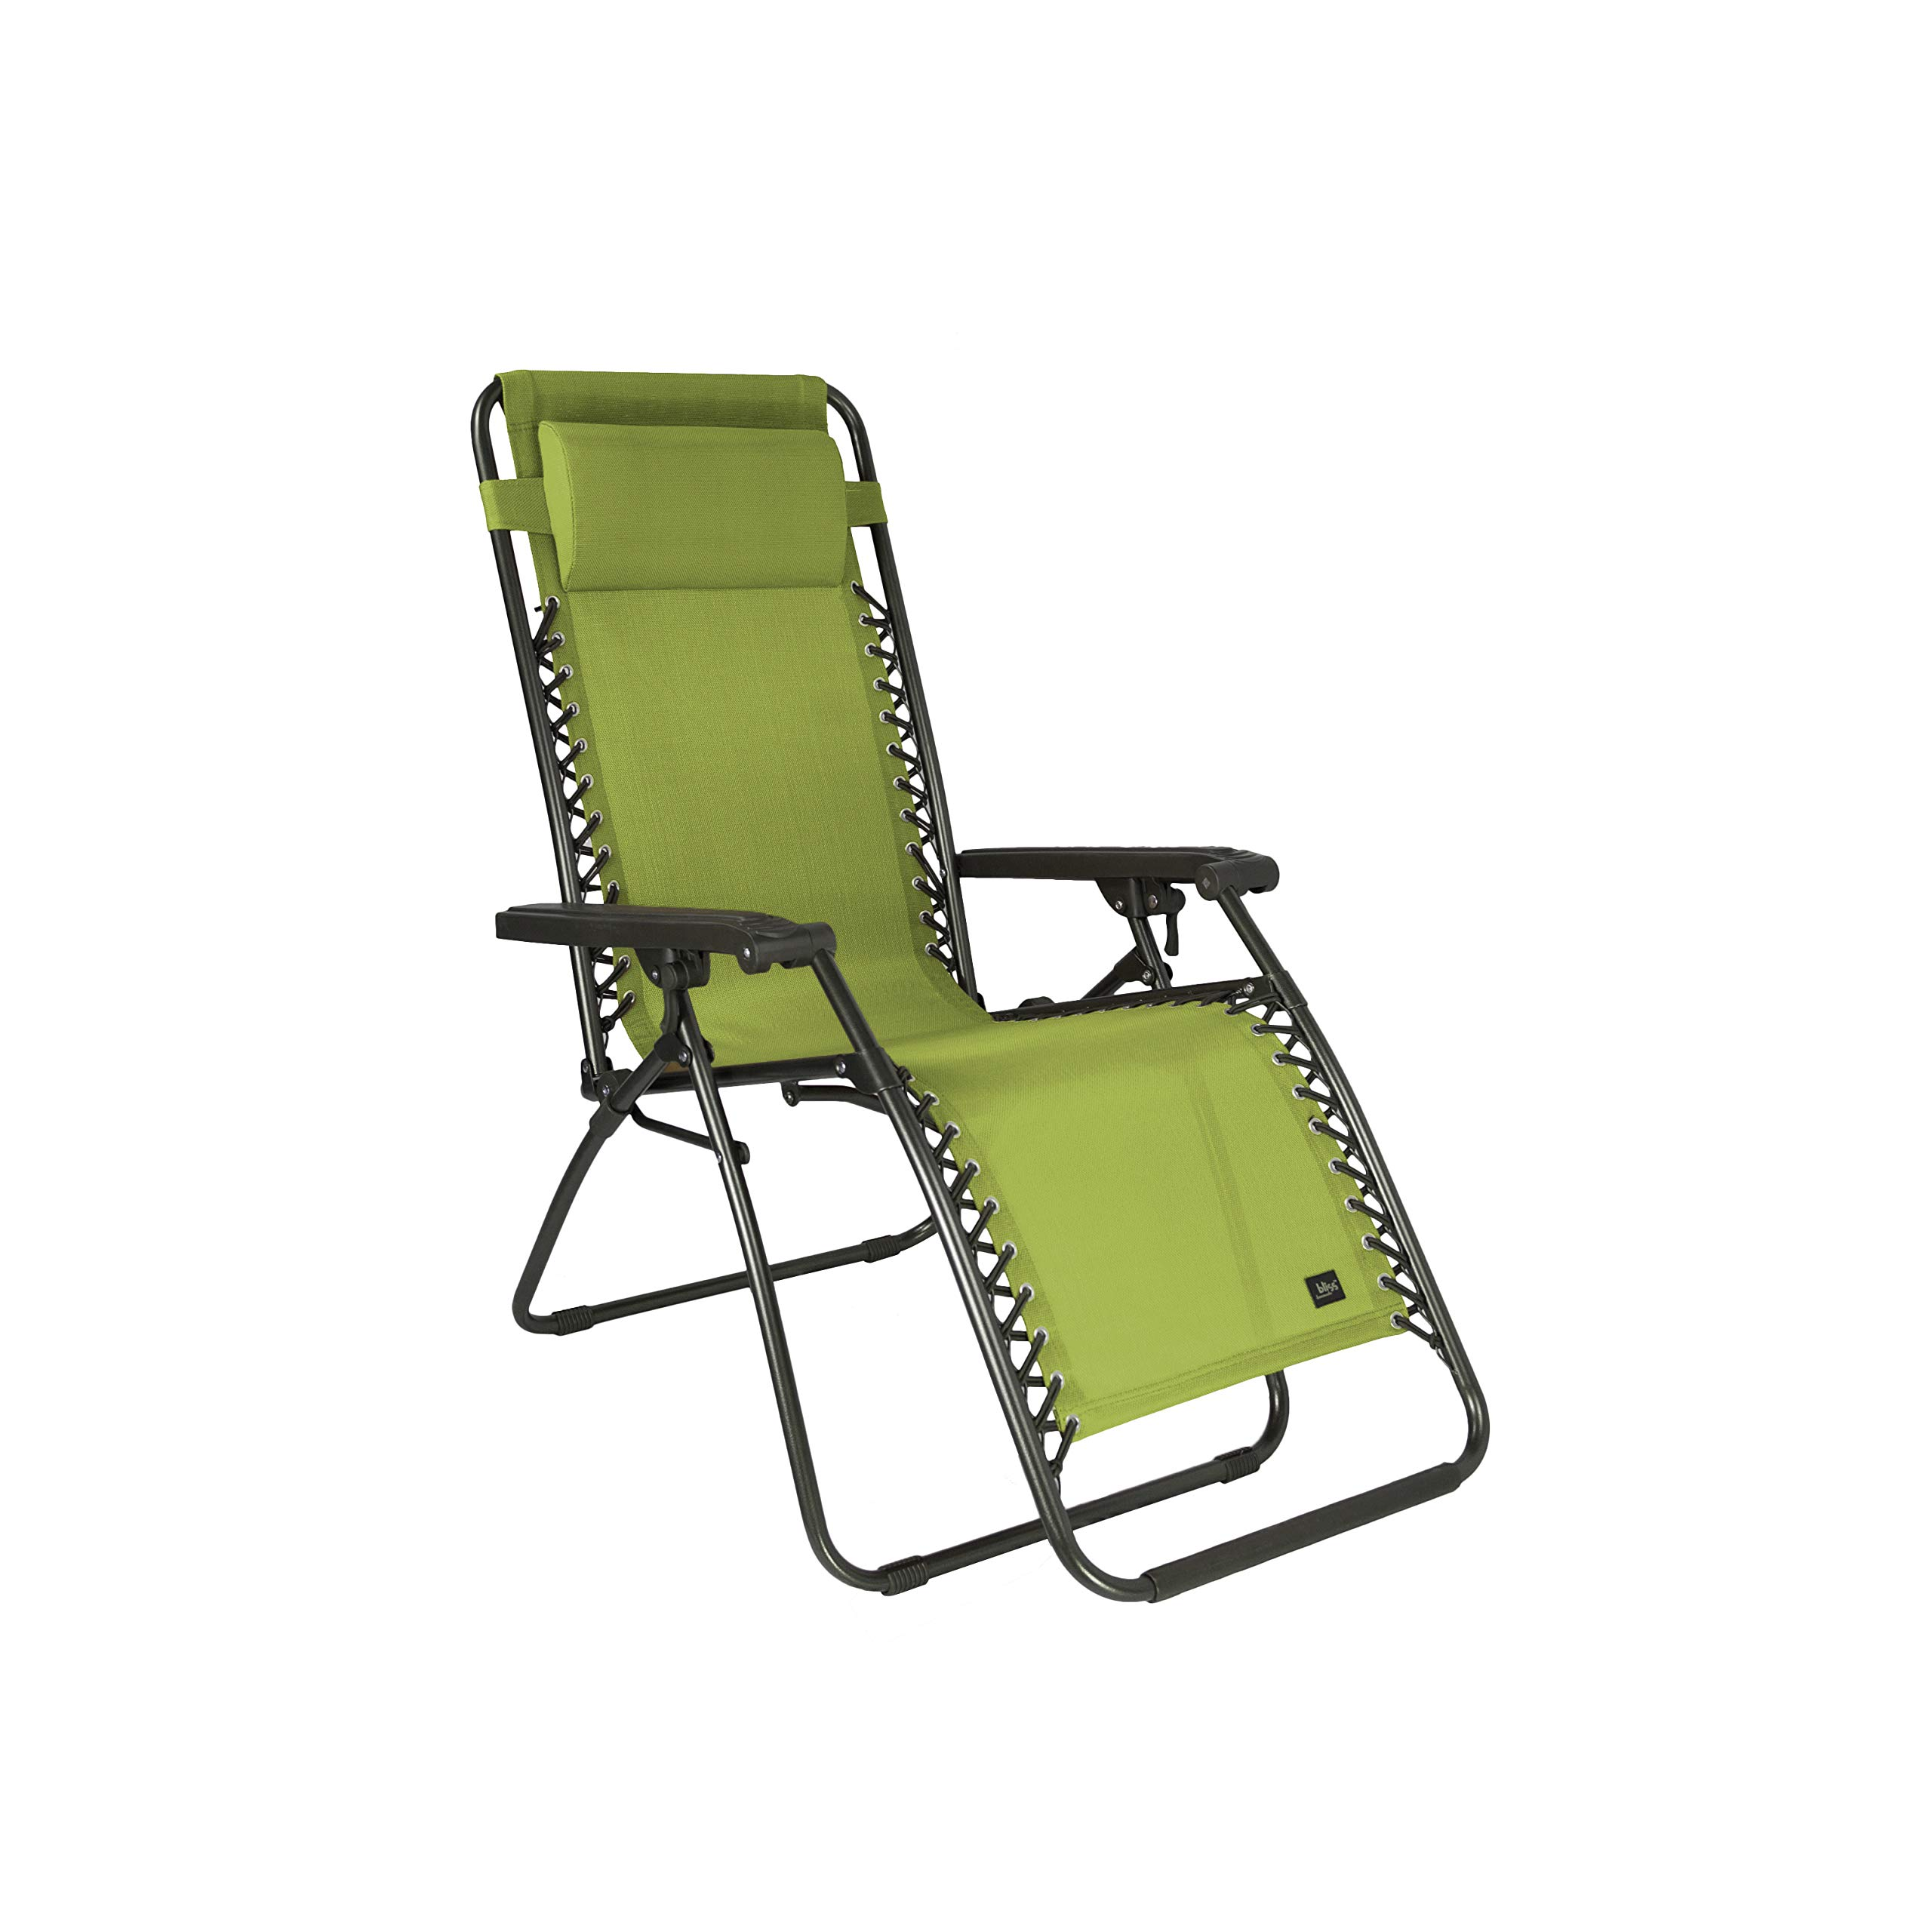 Bliss Hammocks GFC 430SG Gravity Chair